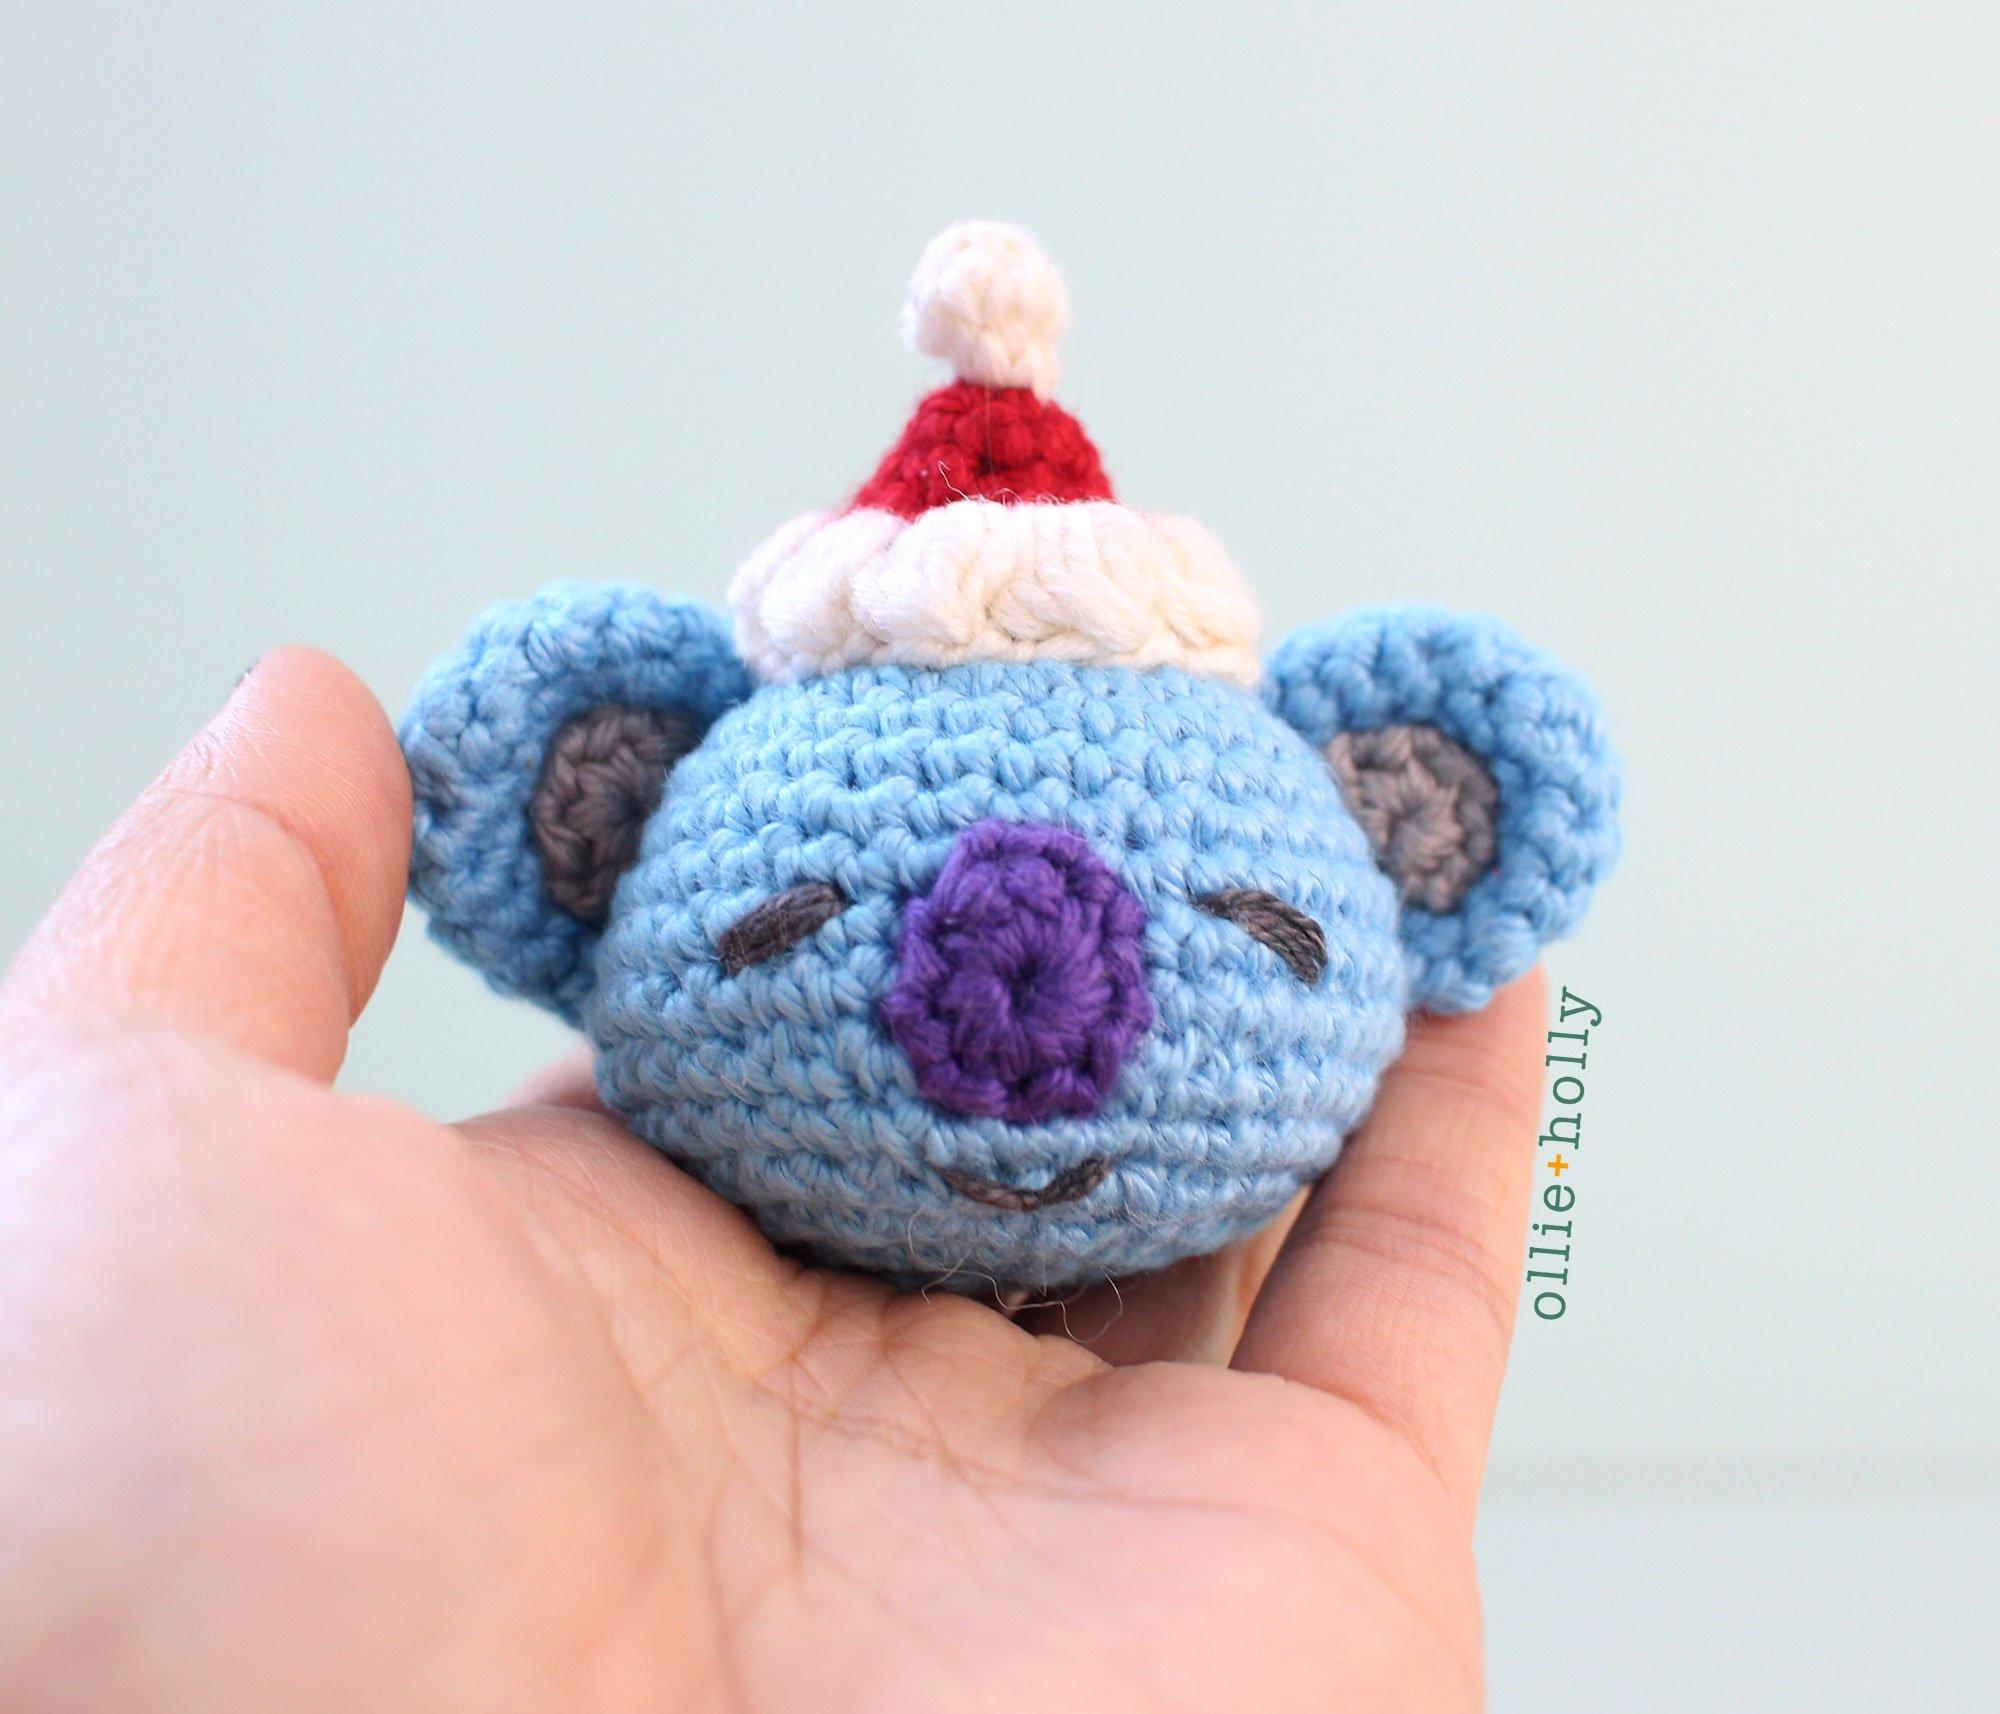 Free BT21 Koya Christmas Ornament Amigurumi Crochet Pattern Step 12